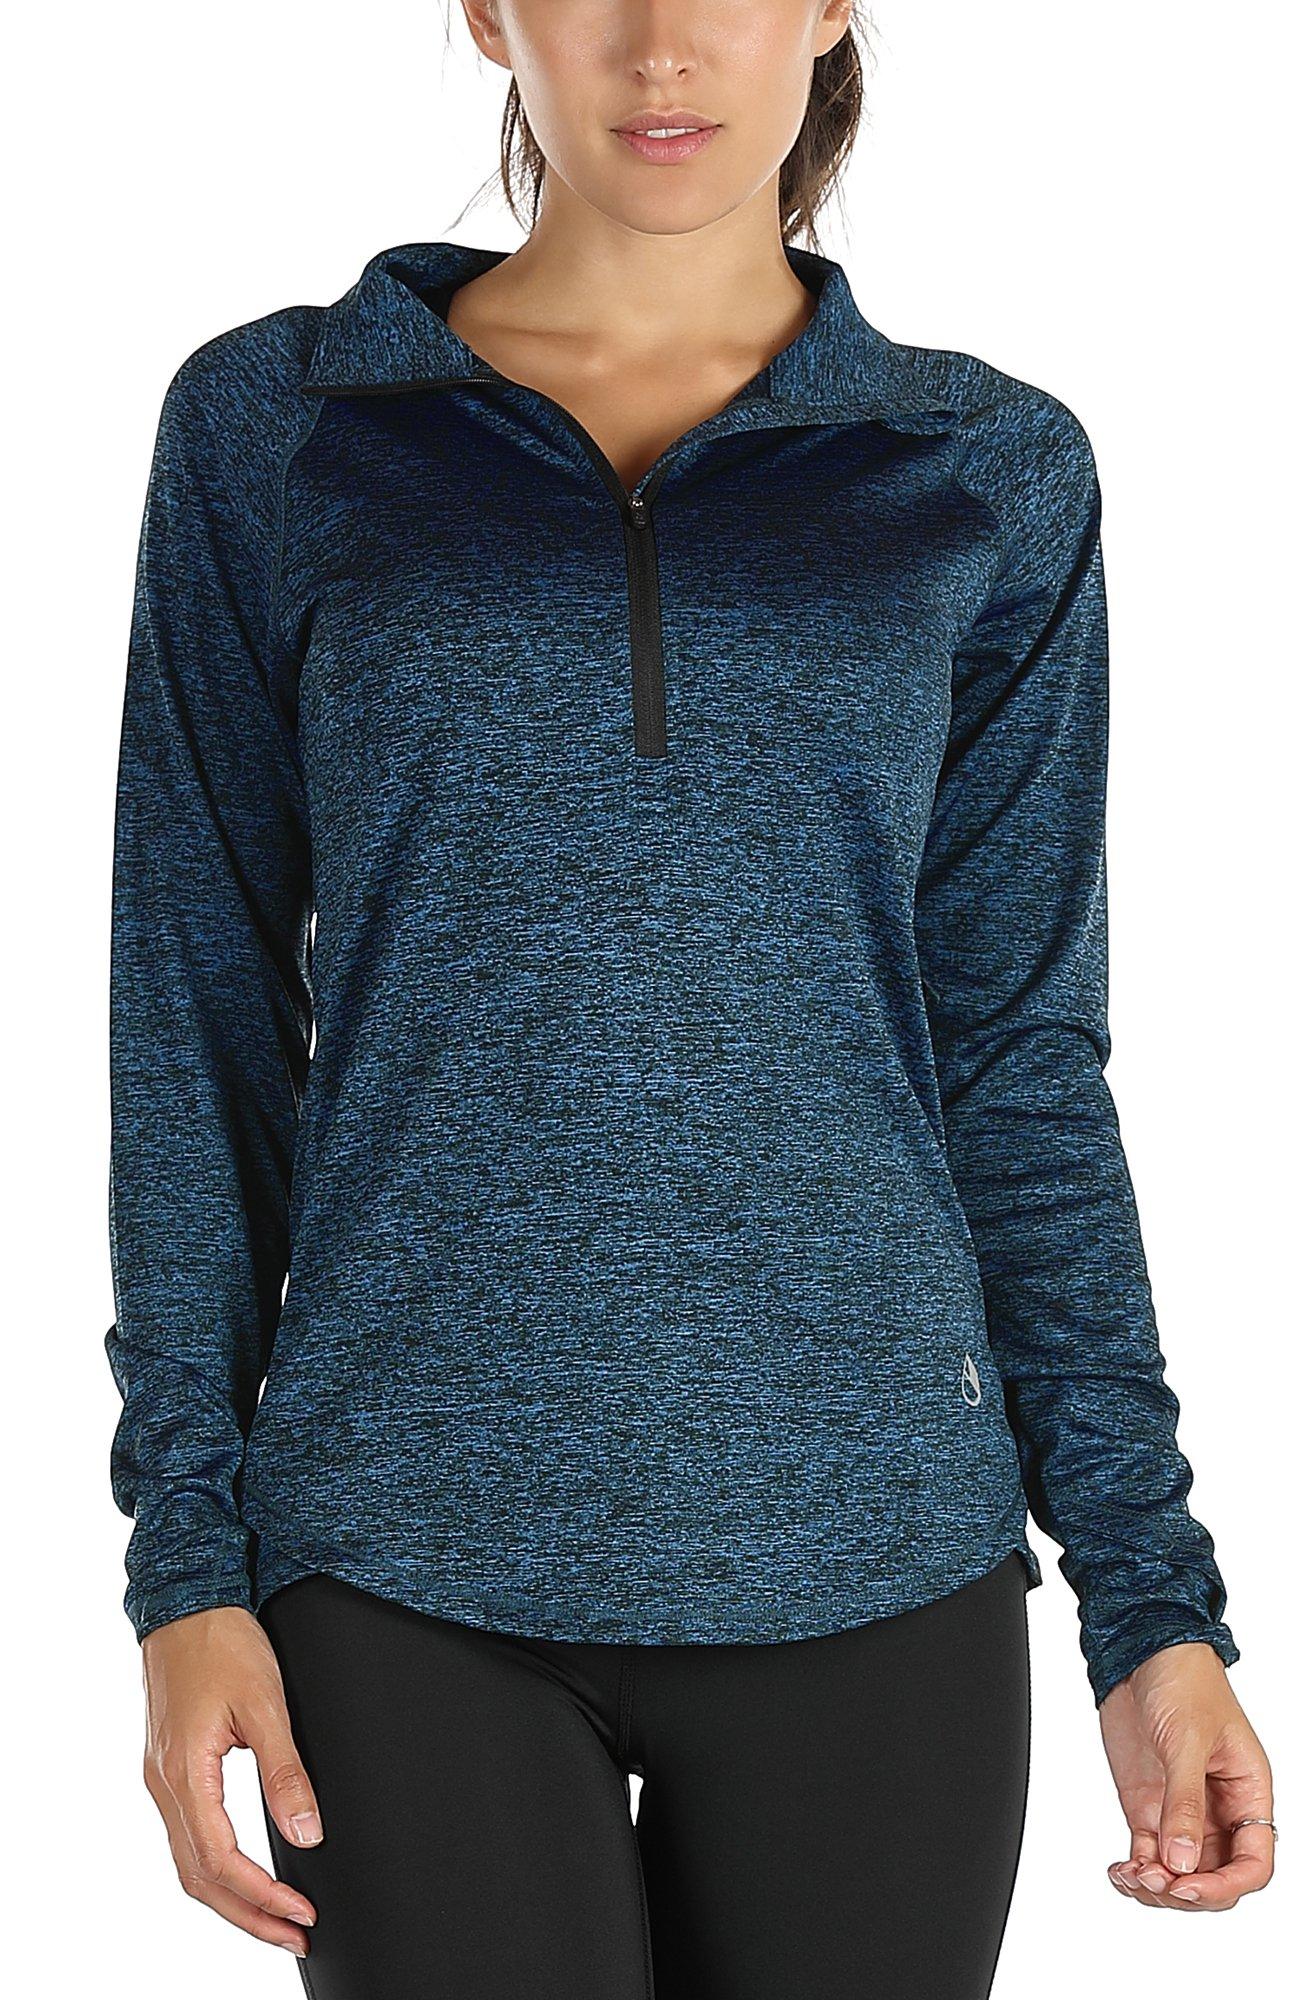 icyzone Women's Workout Yoga Track Jacket 1/2 Zip Long Sleeve Running Shirt(S,Royal Blue)